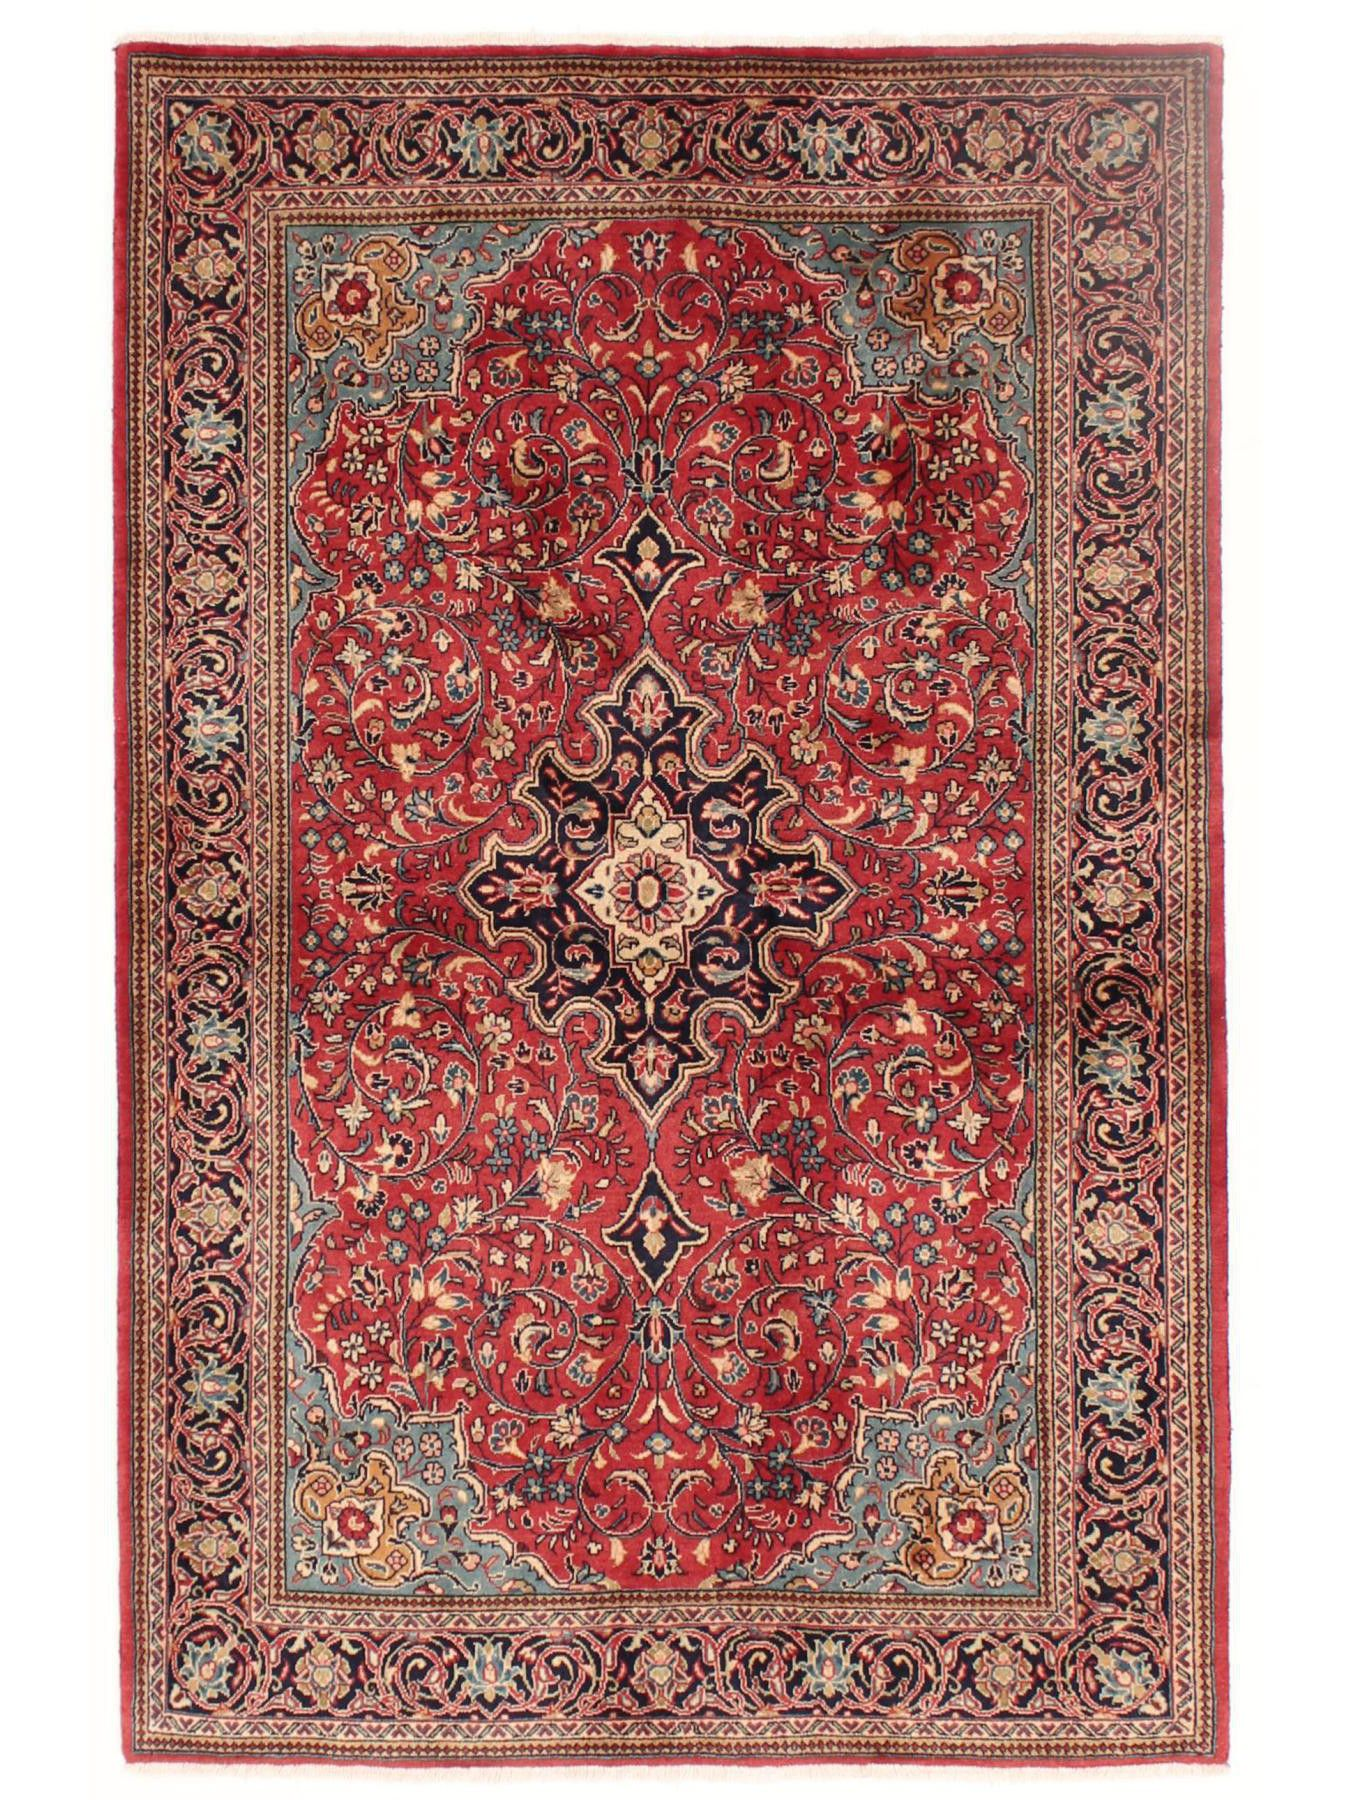 Tapis persans - Sarough  Dimensions:210x134cm